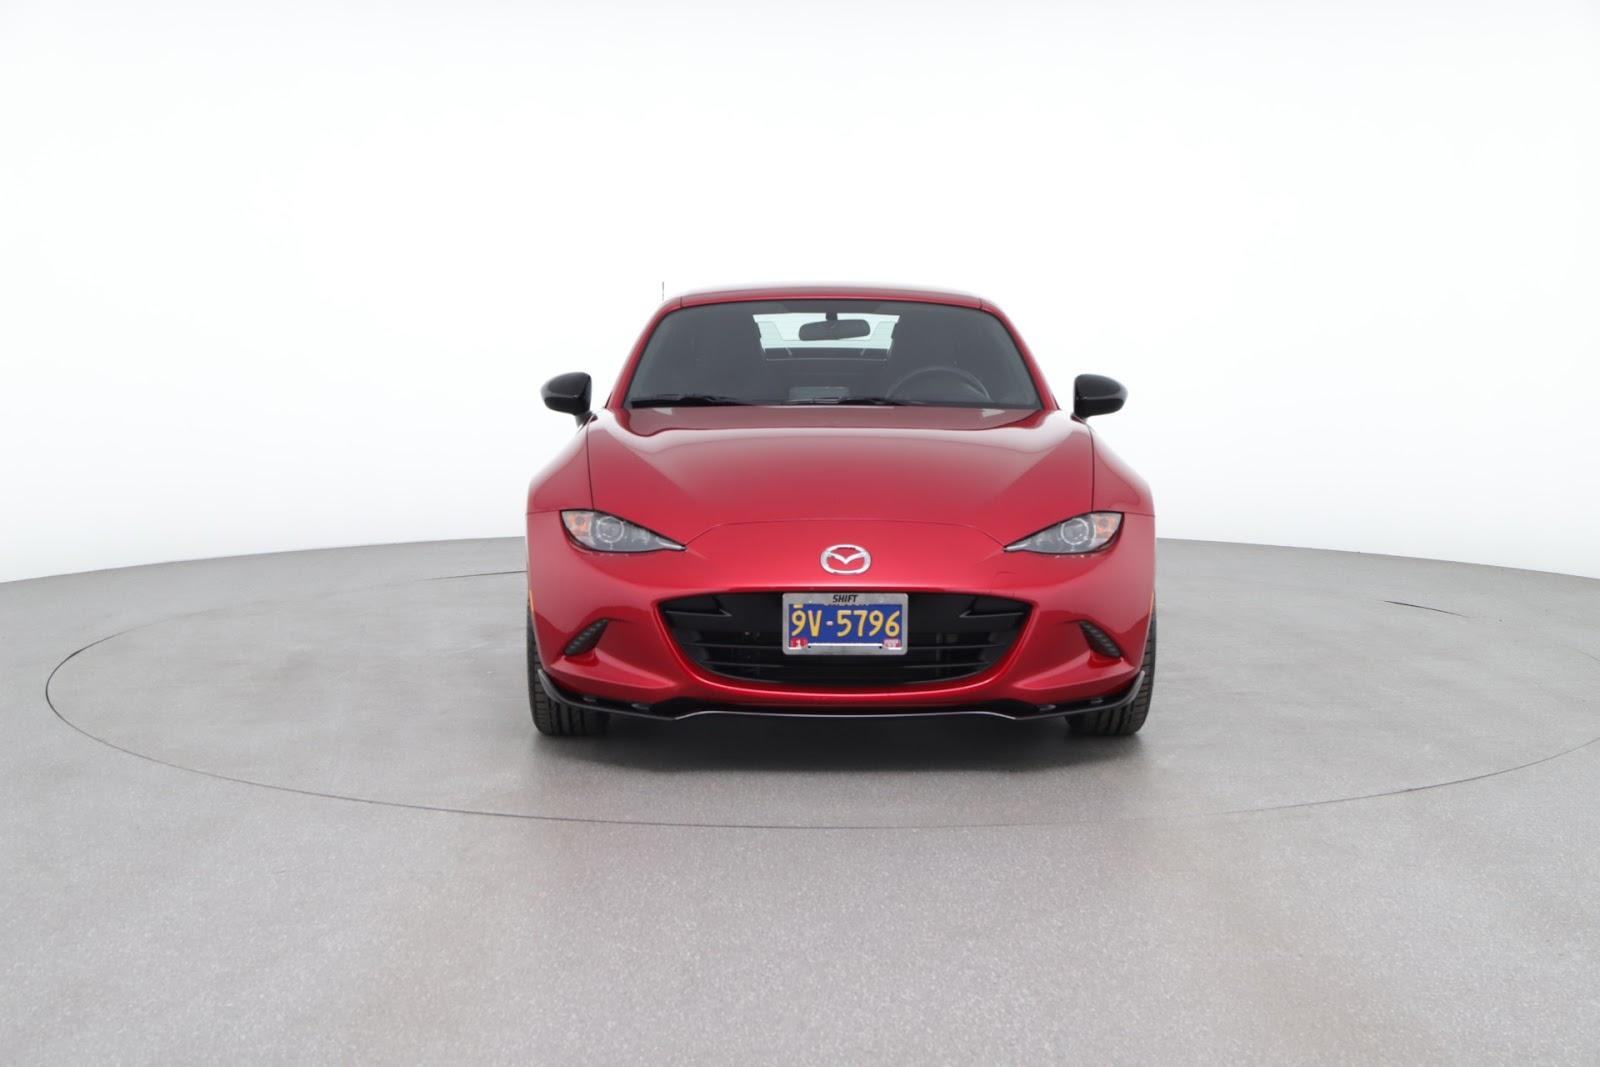 2017 Mazda MX-5 Miata RF Club (from $29,500)